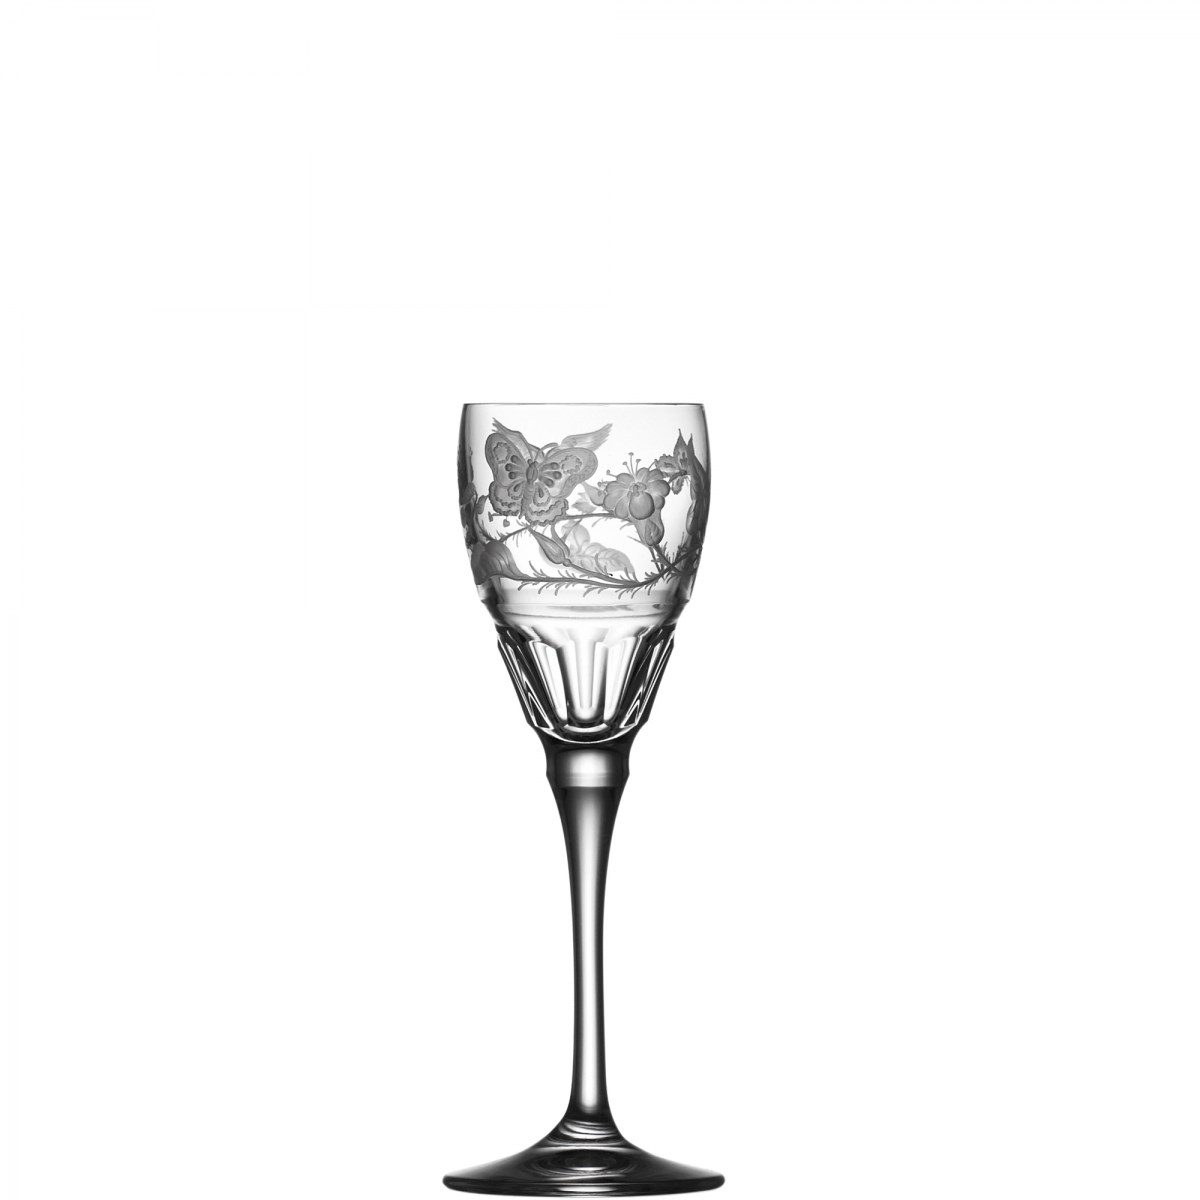 Marbella Clear Cordial - $ 146 / € 128